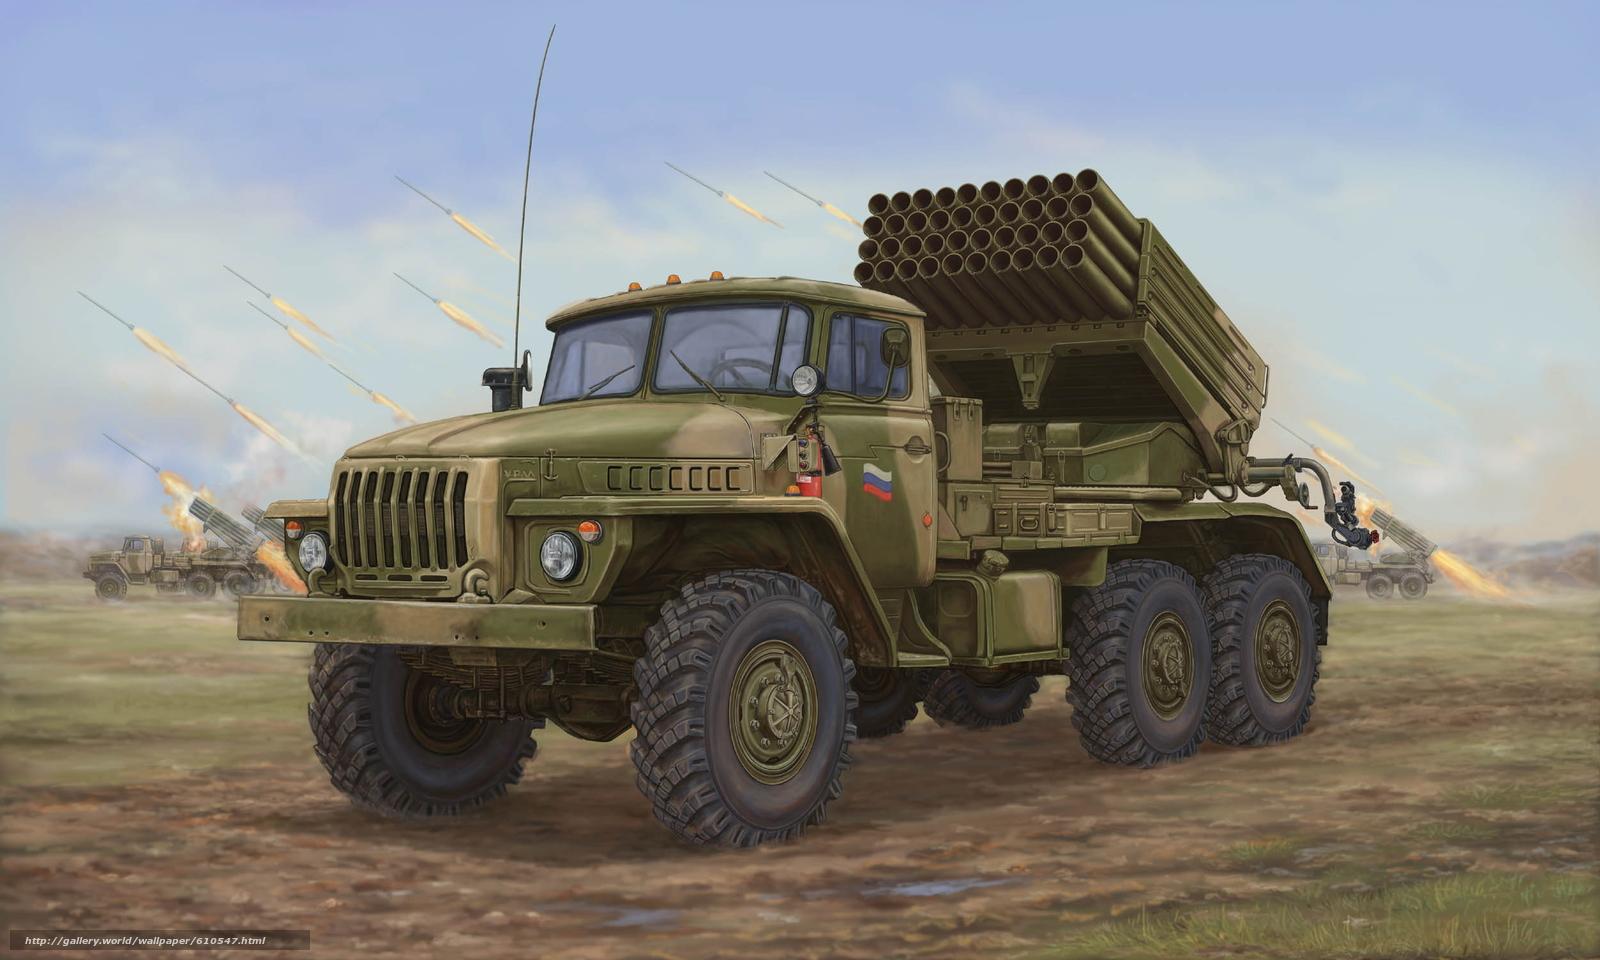 Download wallpaper Art,  Weaponry,  BM-21 Grad MLRS 9K51,  Russia free desktop wallpaper in the resolution 2500x1500 — picture №610547